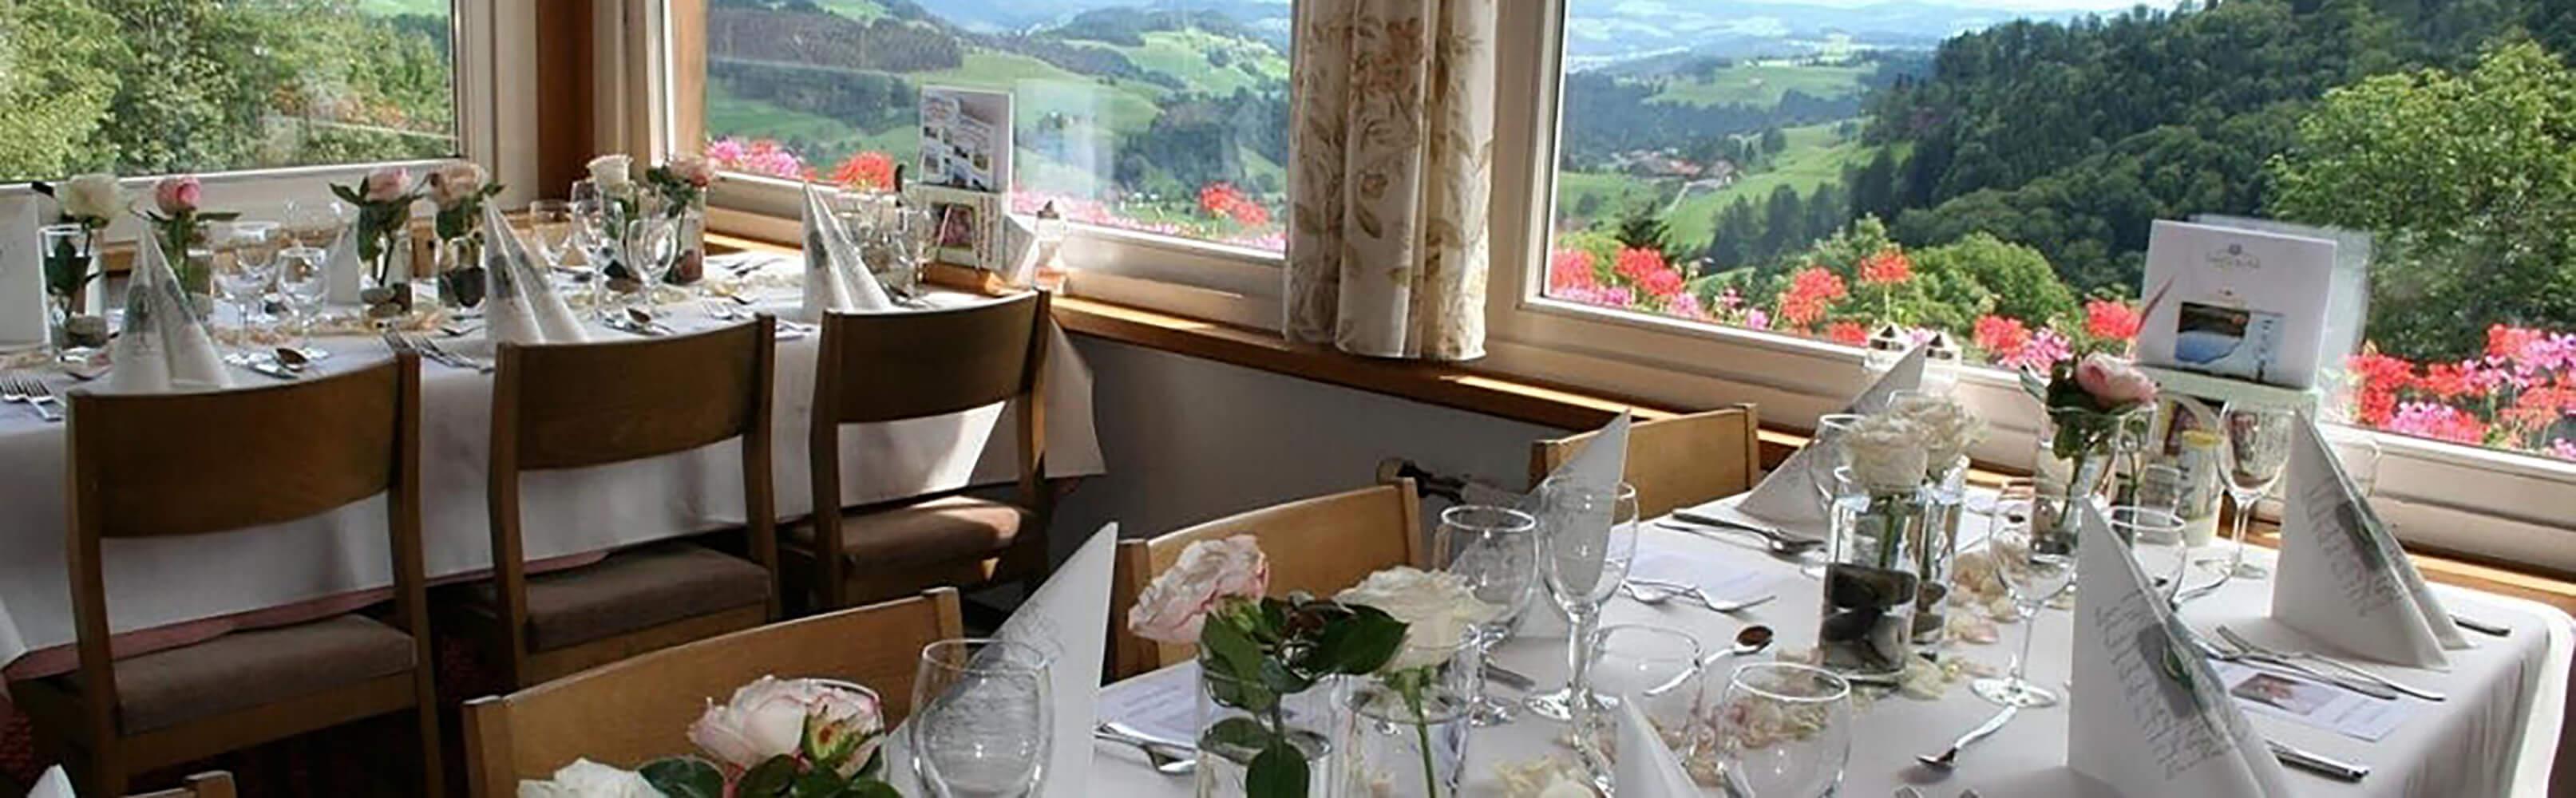 Hulfteggpass / Witzweg / Wandern / Töfftreff / Ausflug / Zürich-St.Gallen 1